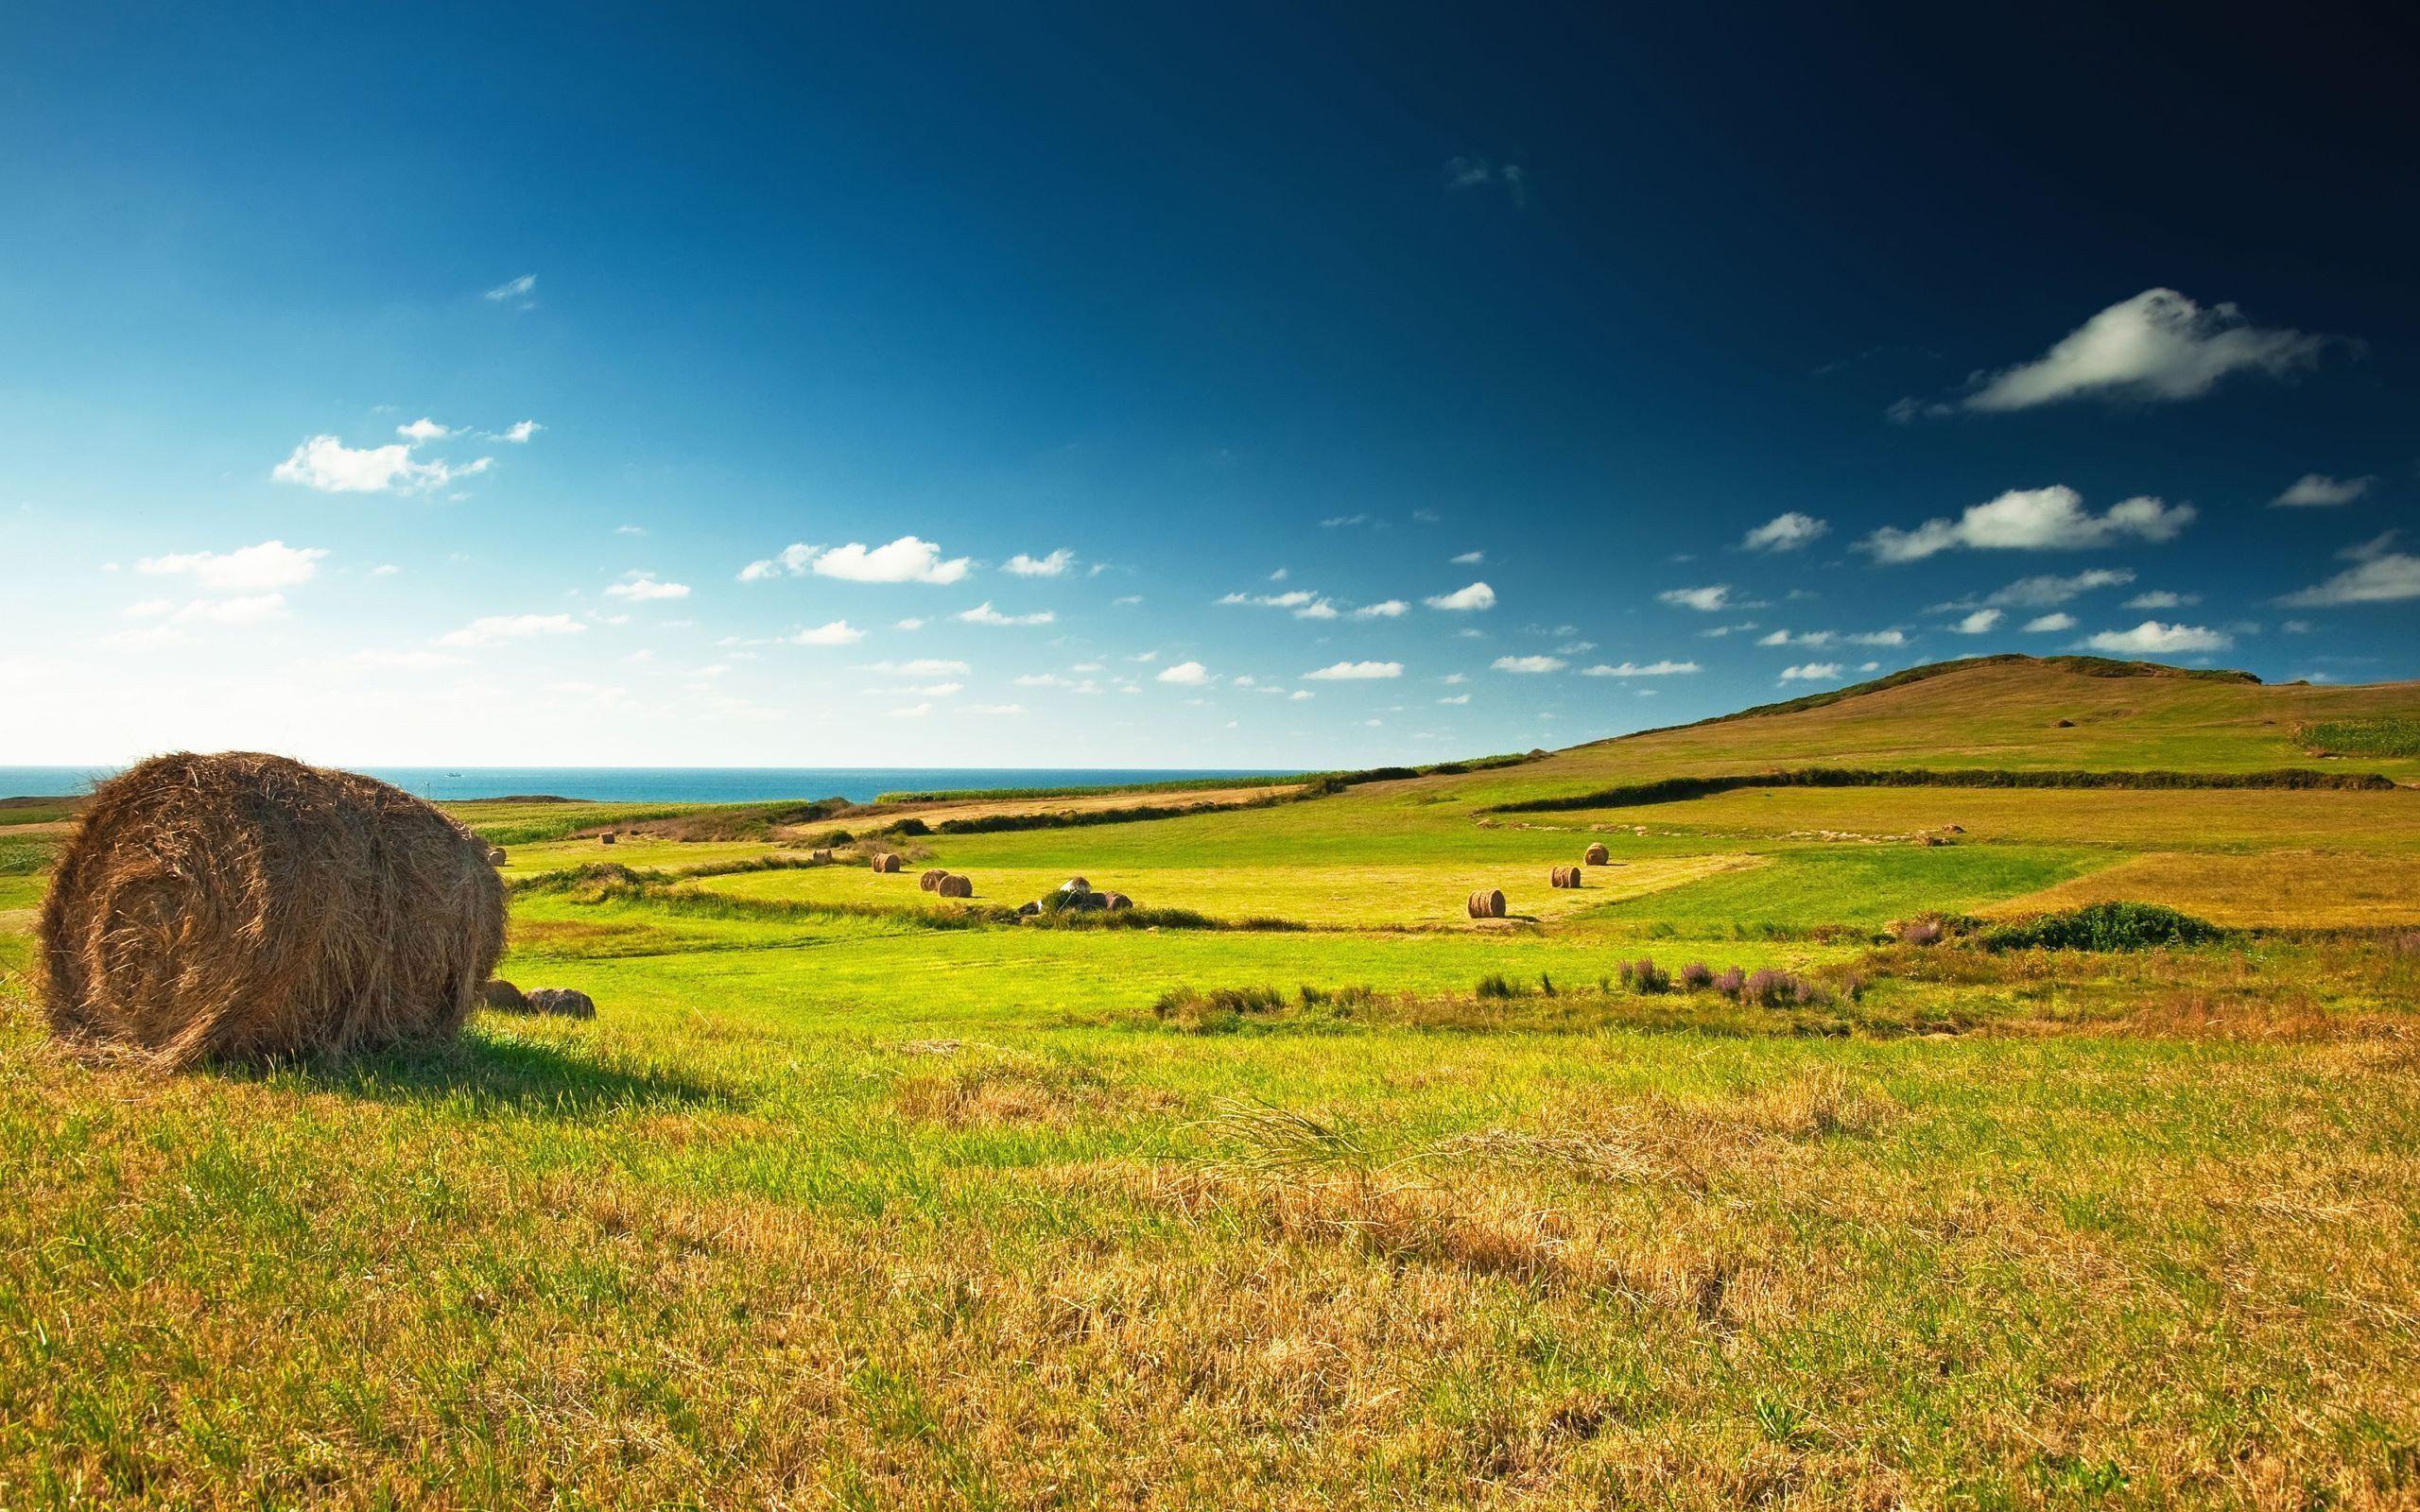 Landscapes Skylines Fields Farms Desktop Background Images